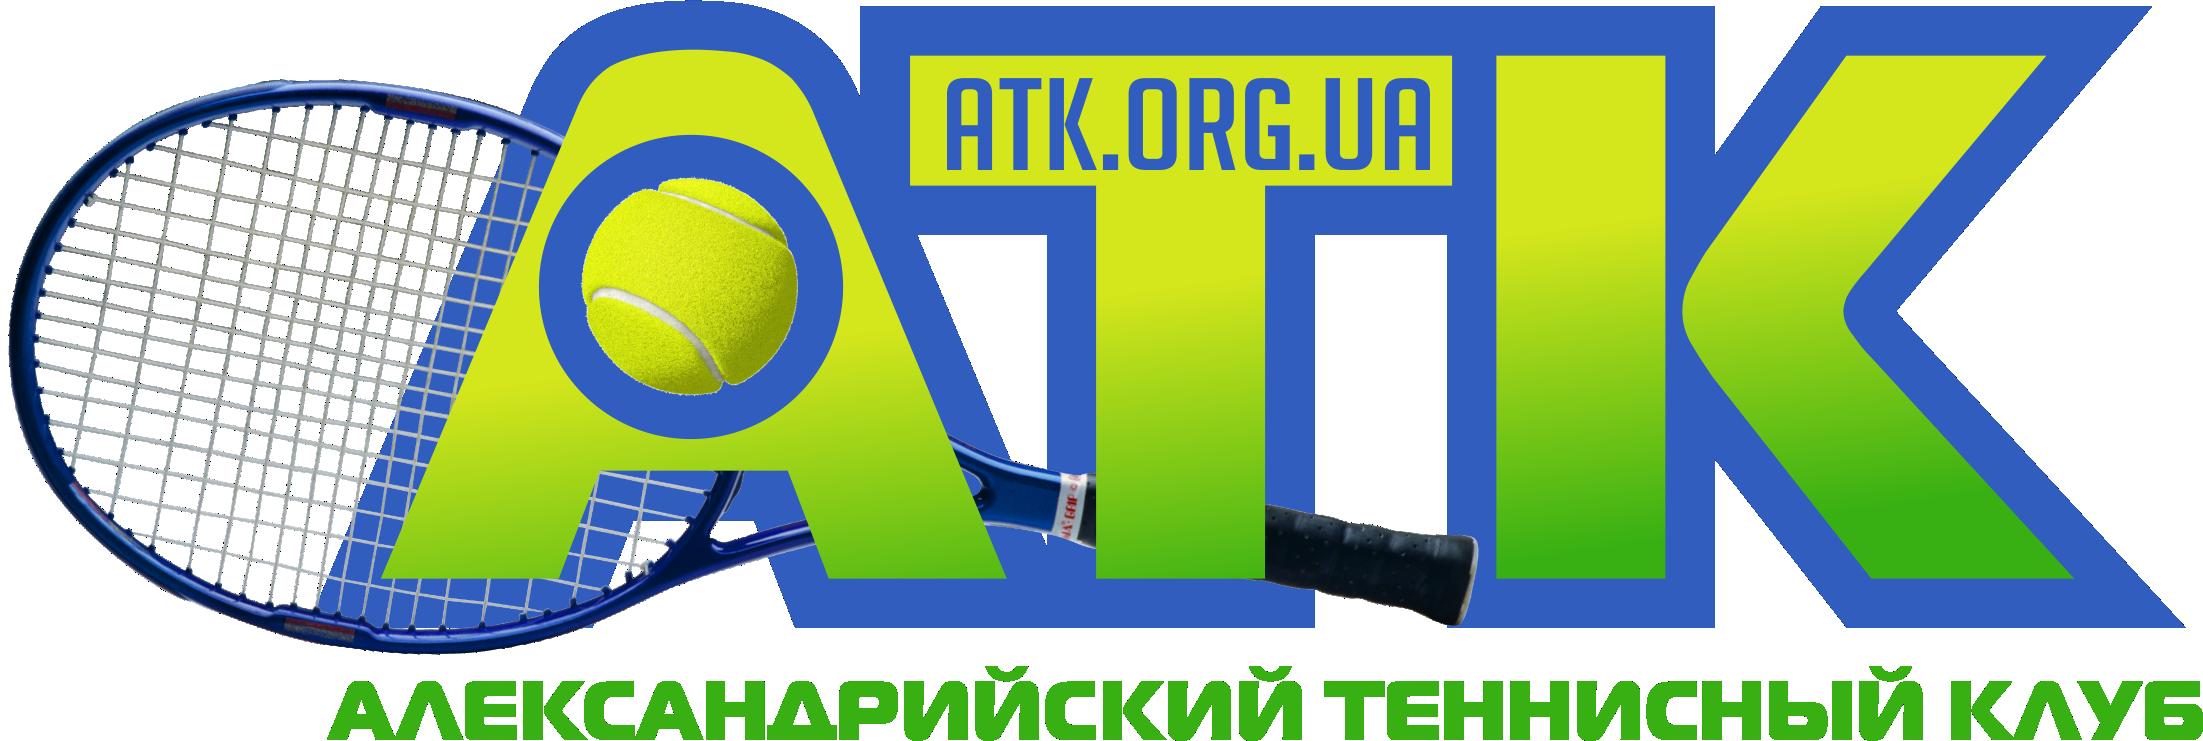 Александрийский теннисный клуб